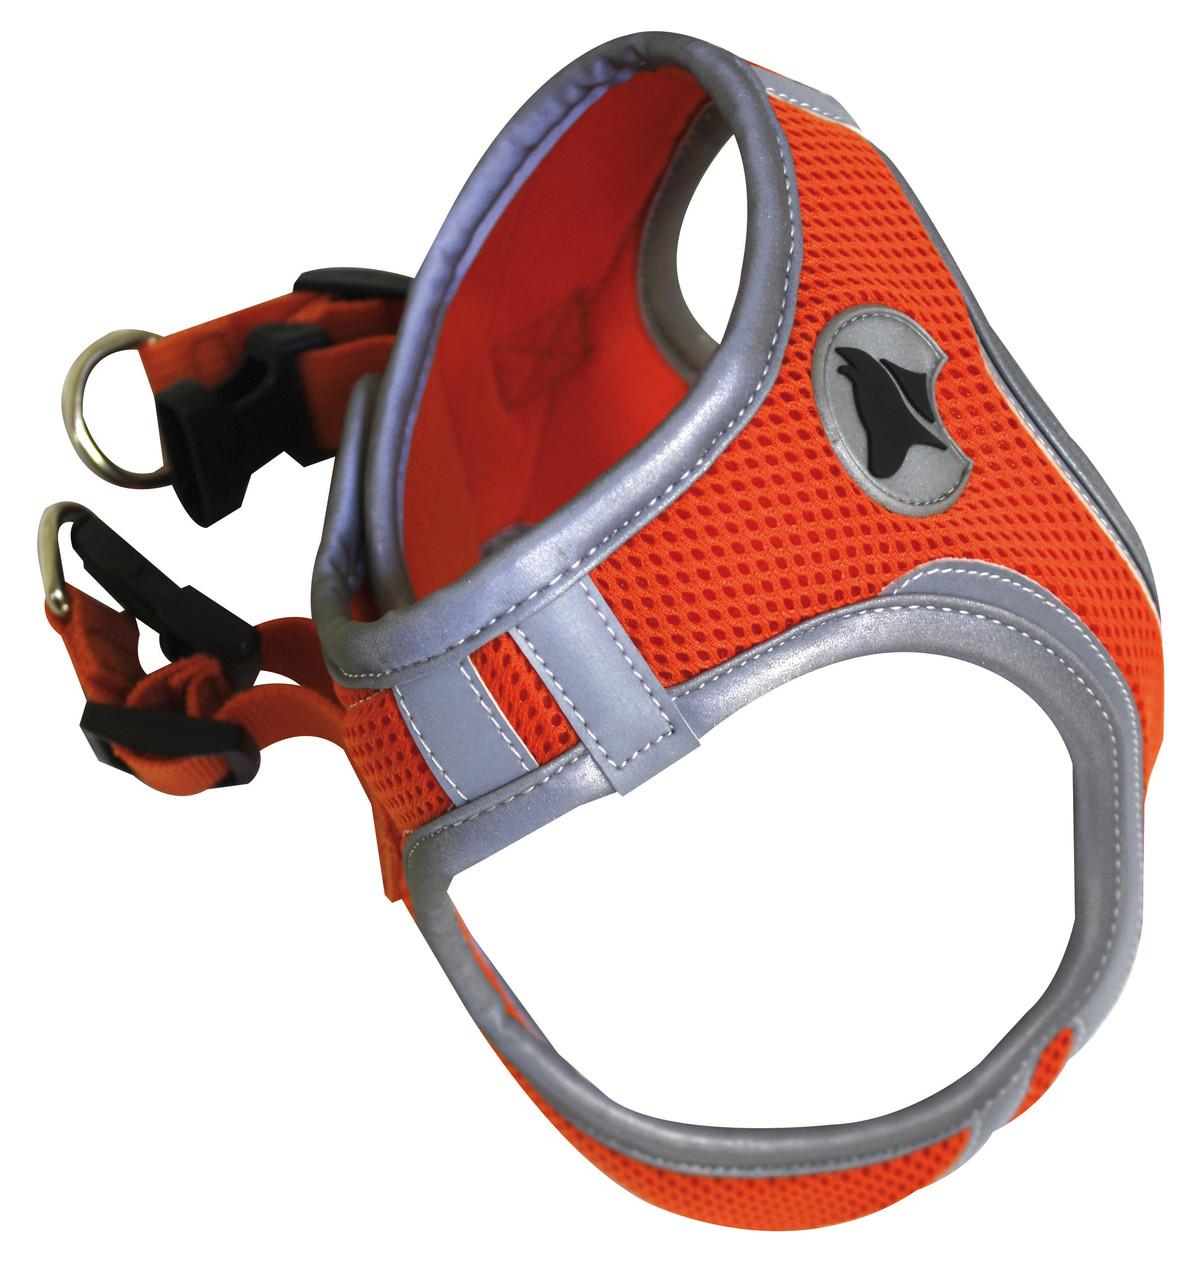 Шлея для собак 41-46 см HIKING REFLECTIVE. Оранжевая, нейлон, M